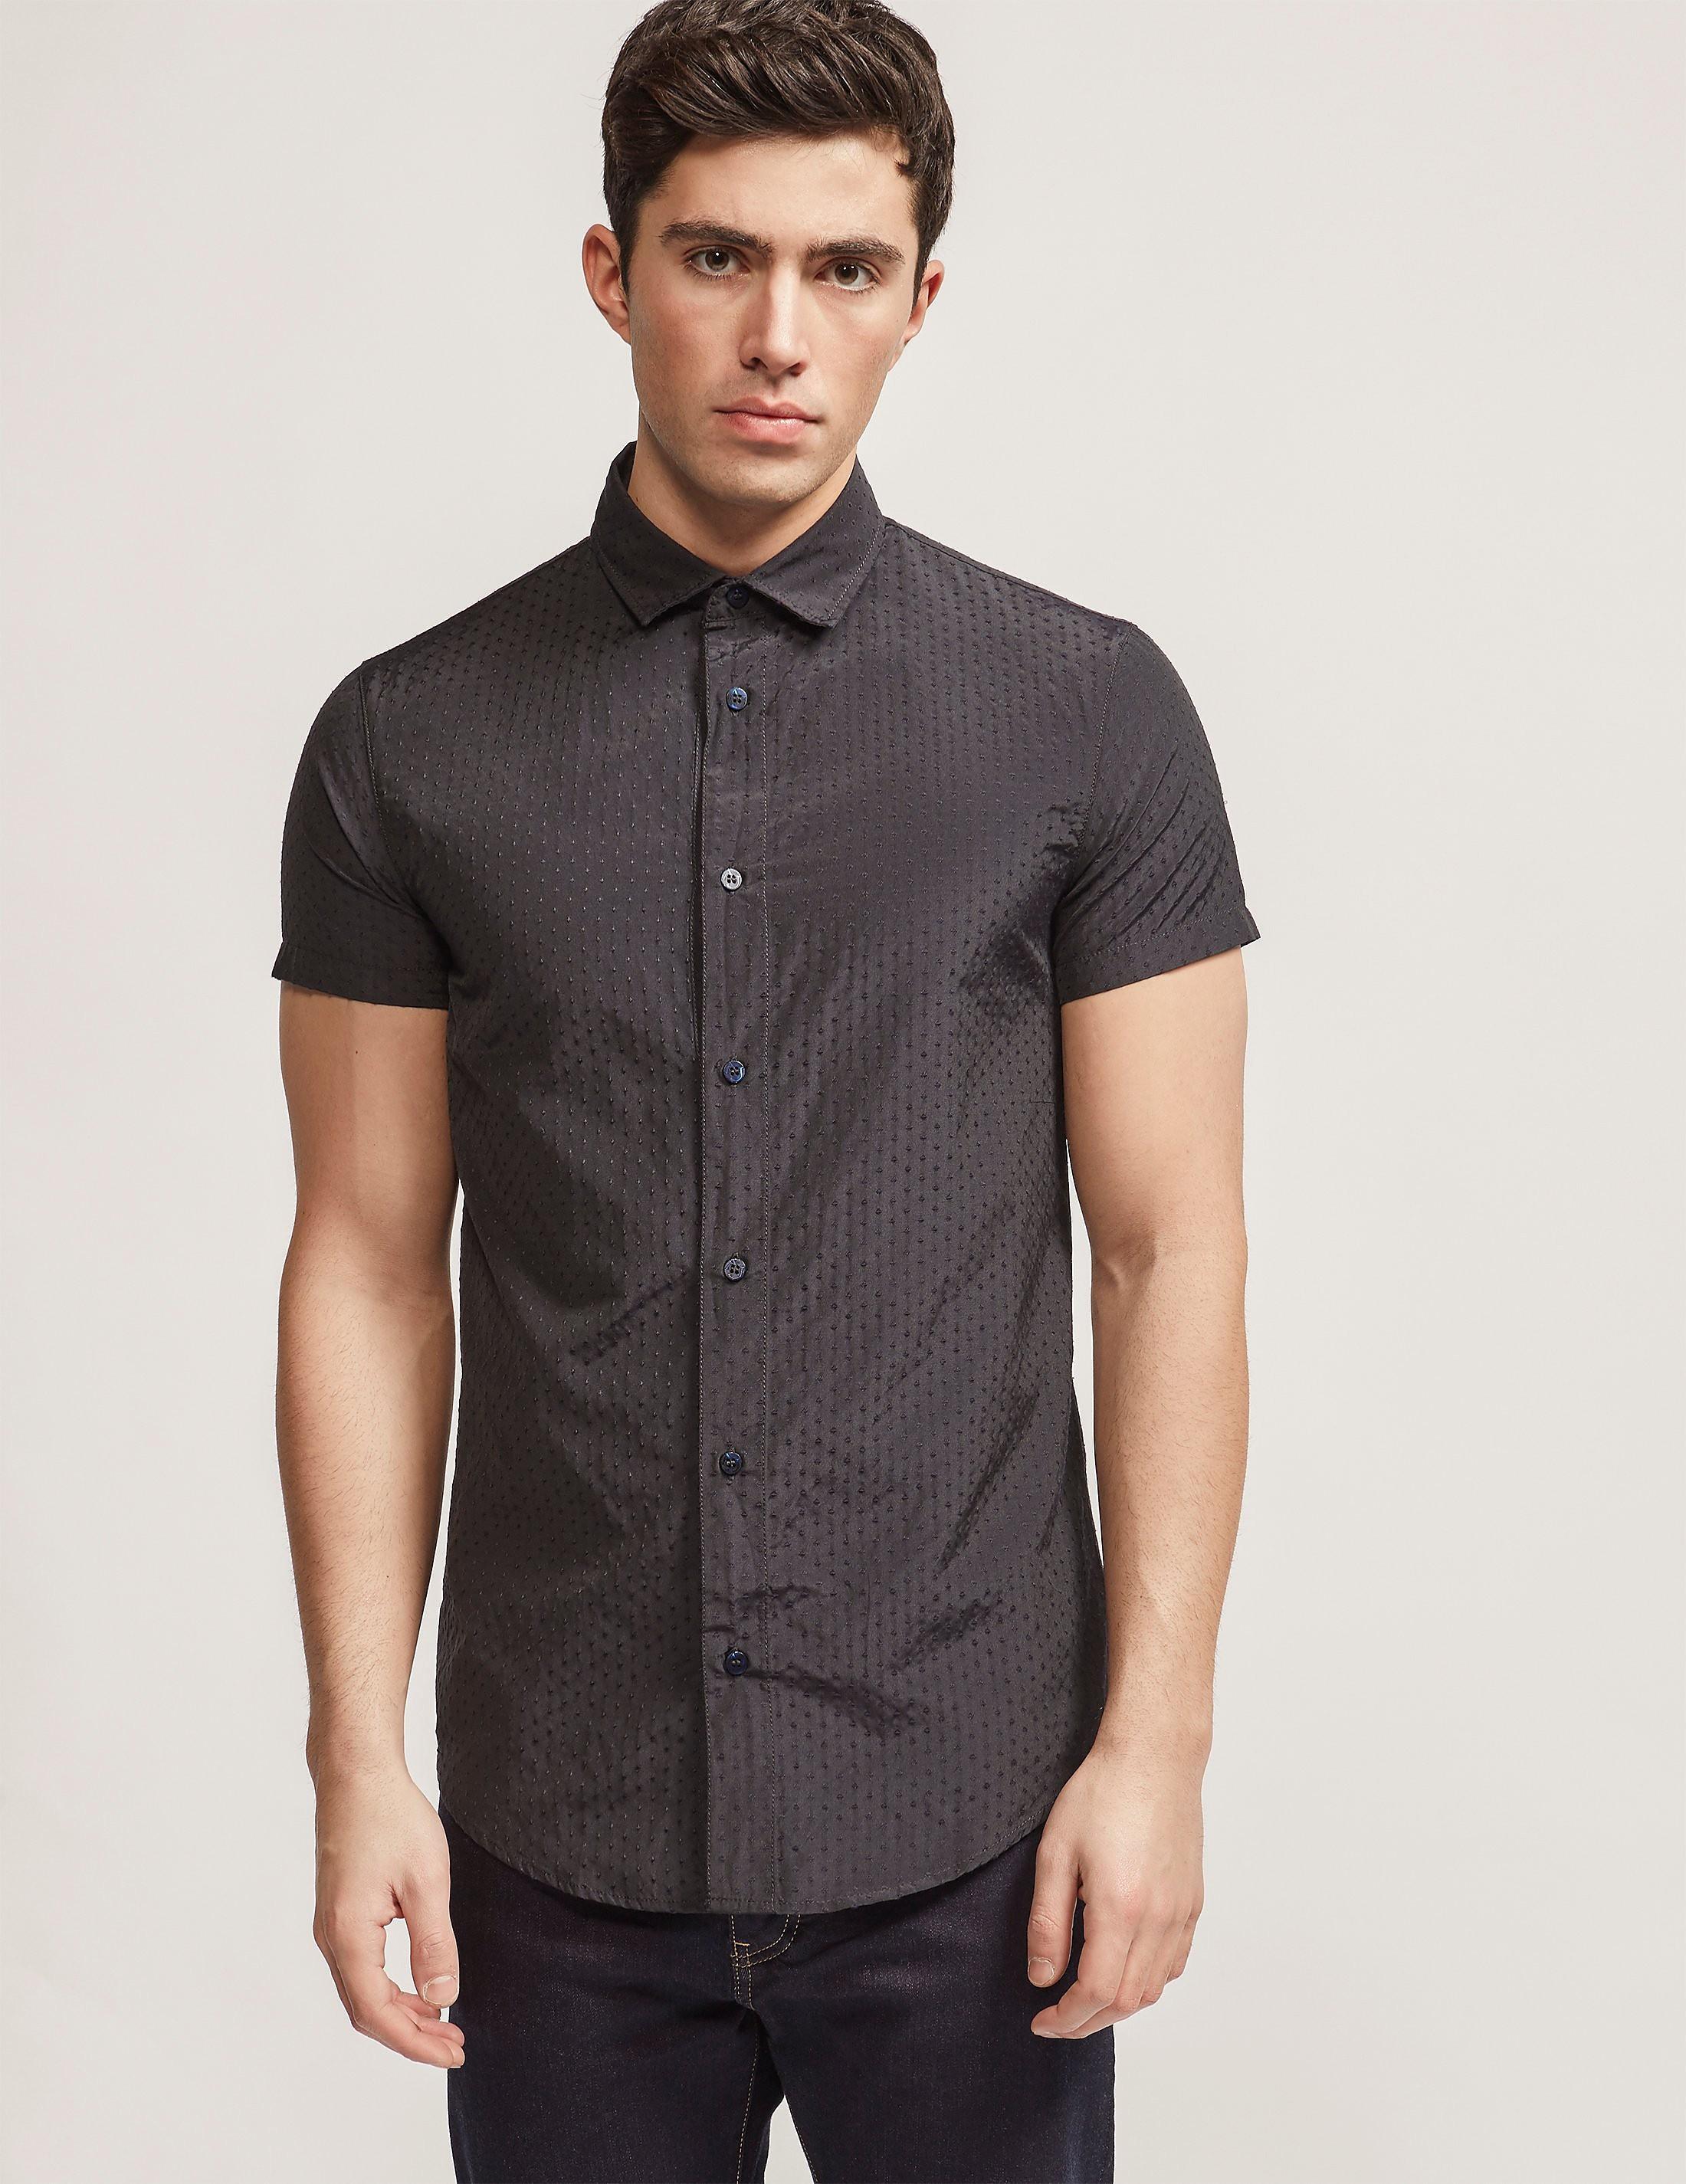 Armani Jeans Polka Dot Short Sleeve Shirt